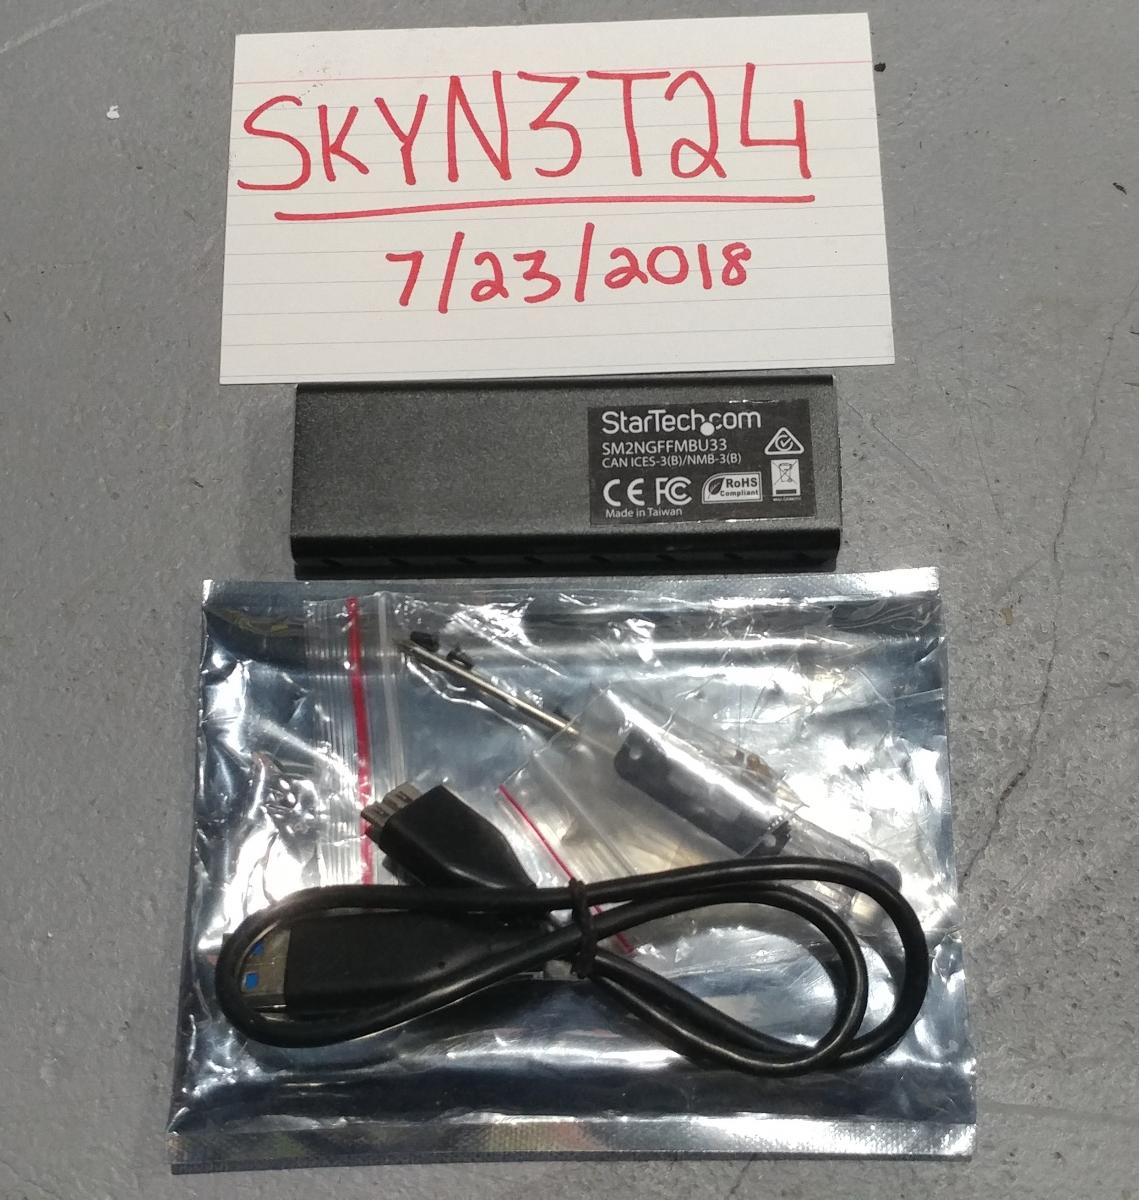 Photo of StarTech M.2 NGFF SATA SSD Portable USB 3.0 Aluminum Enclosure